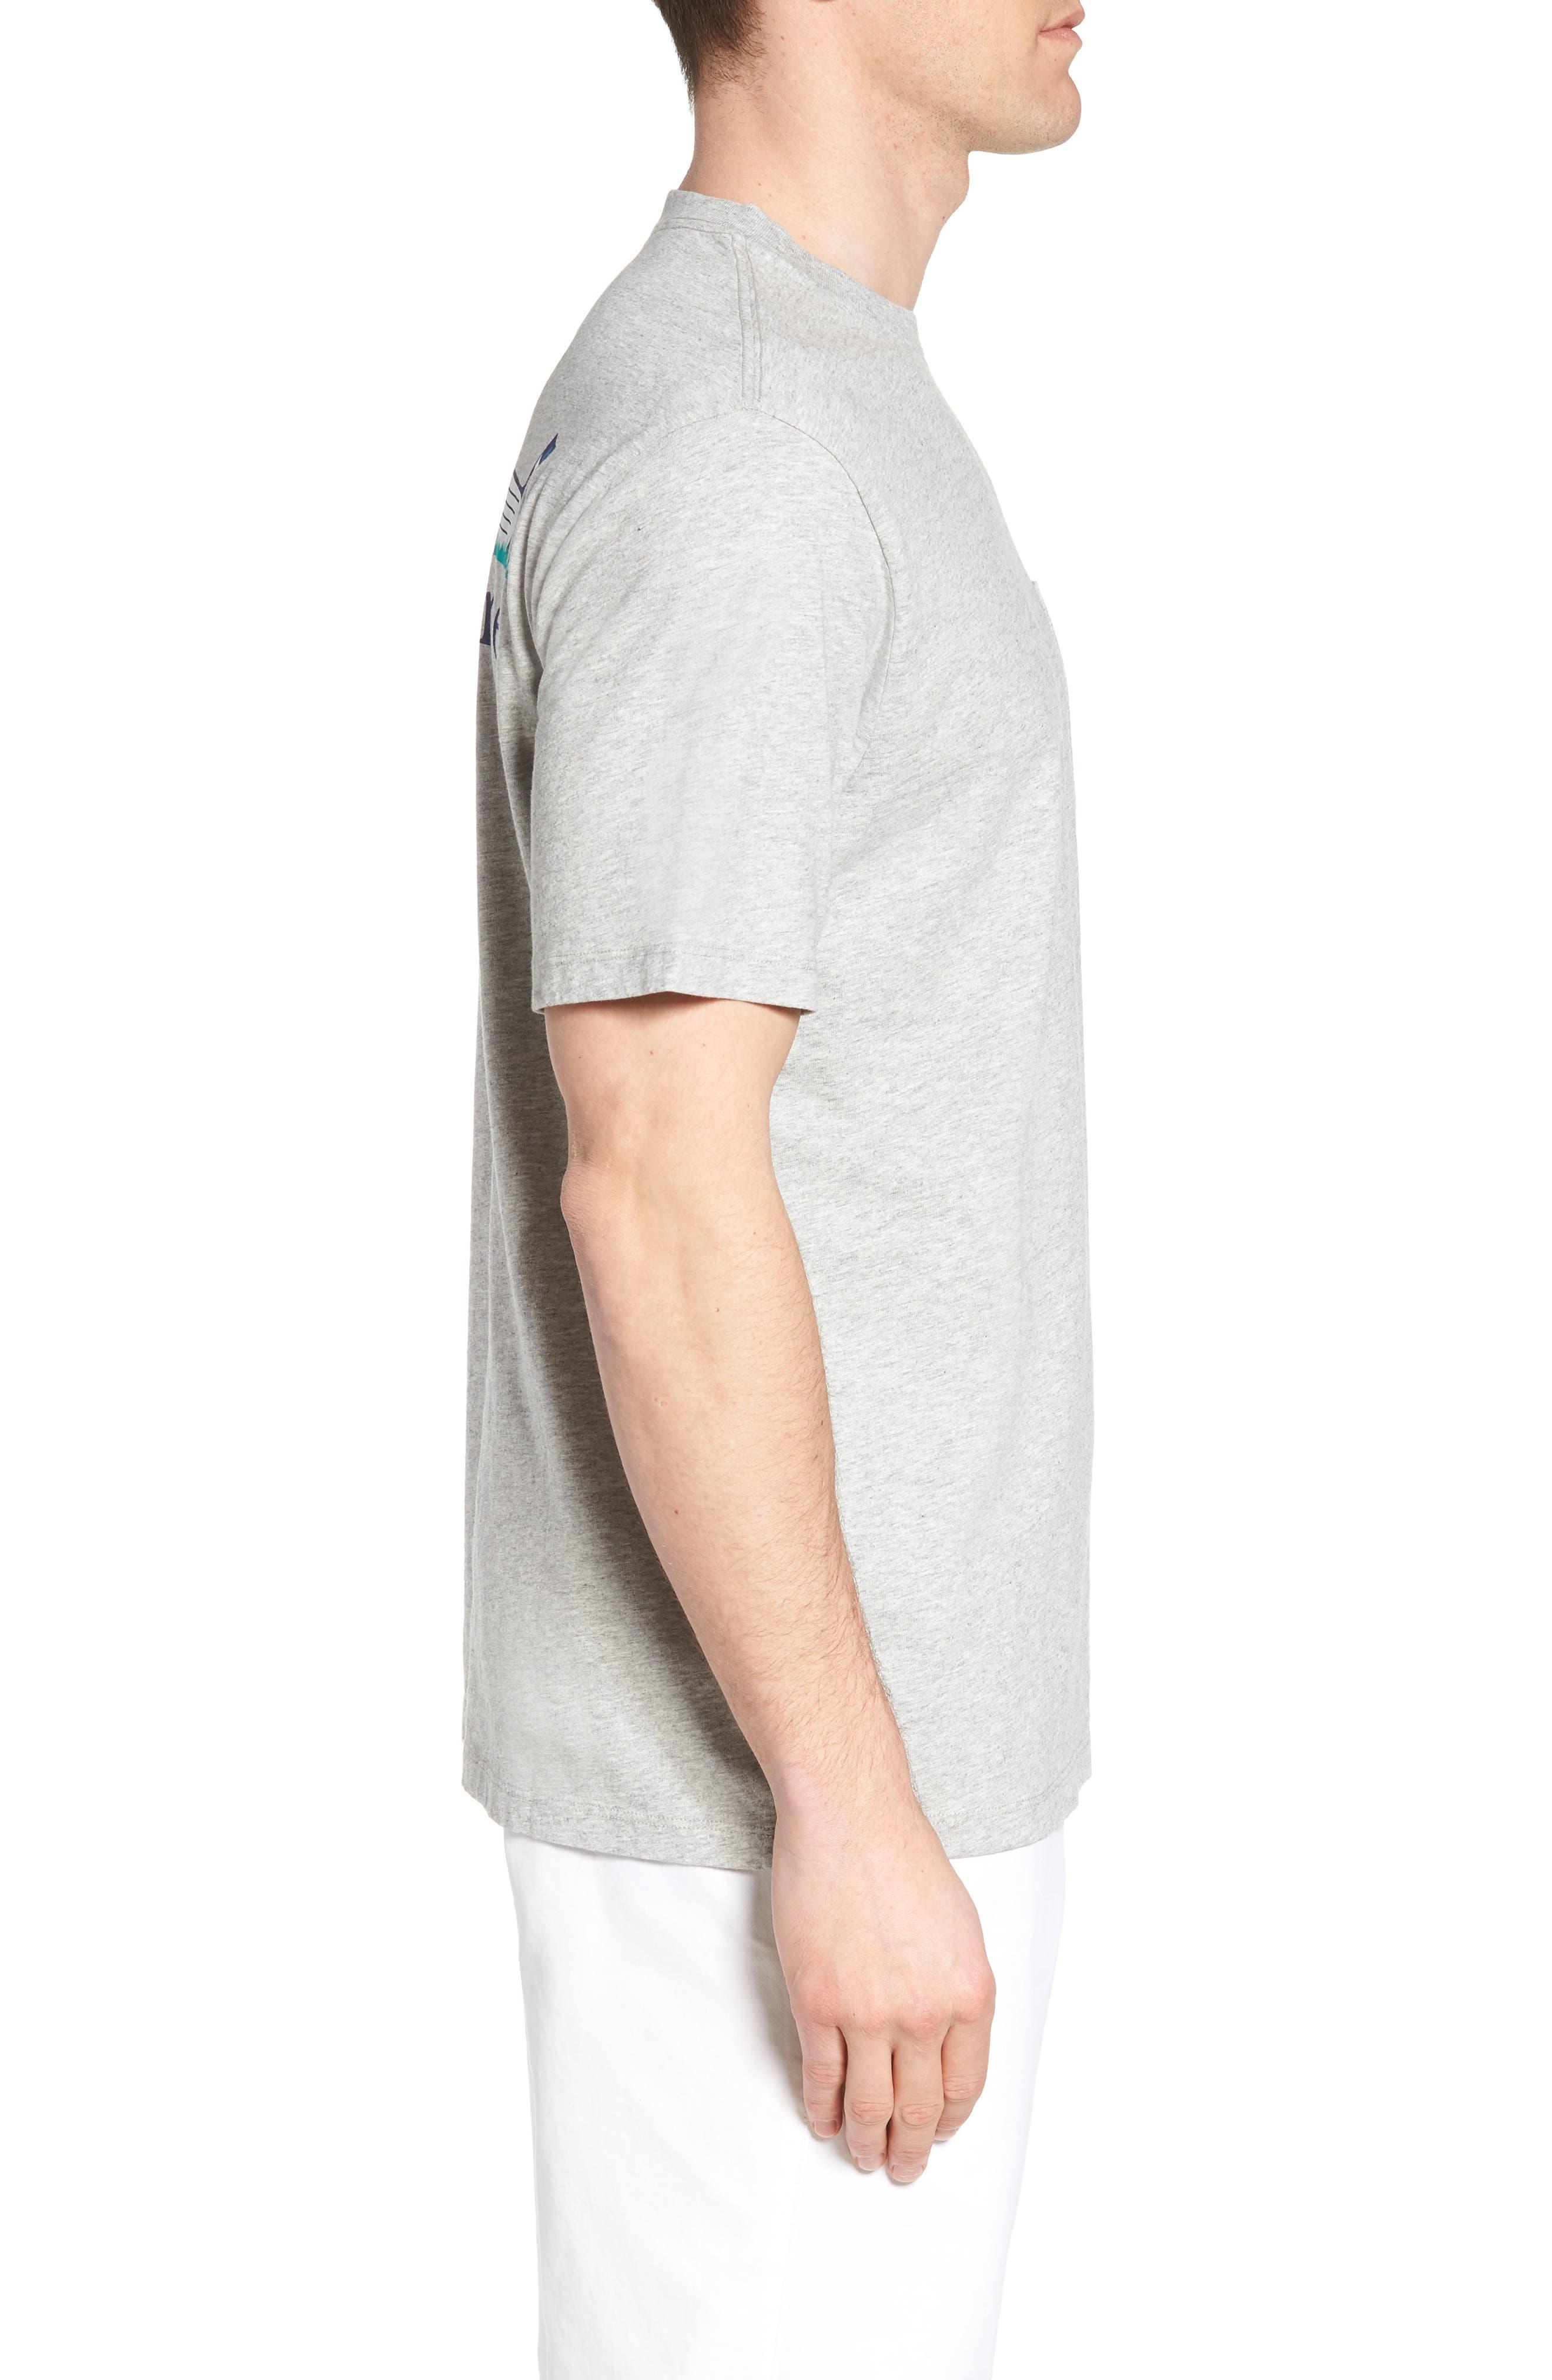 Alternate Image 3  - vineyard vines Regular Fit Golf T-Shirt